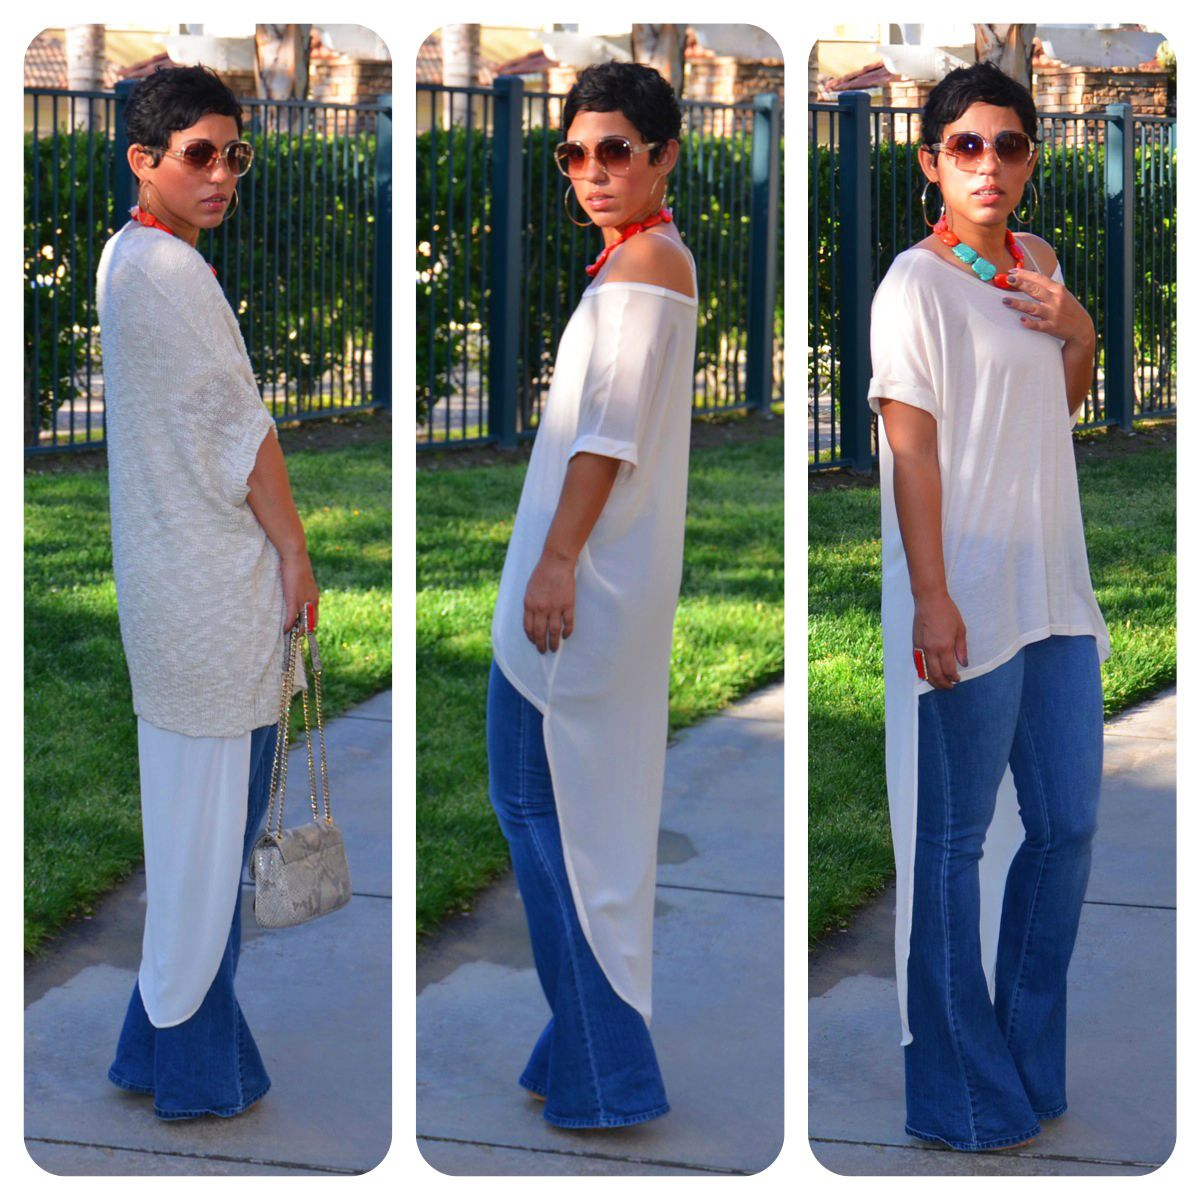 Tutorial Waterfall Or Peplum Or High Low Kimono Top Sewing Design Diy Sewing Peplum Top Diy